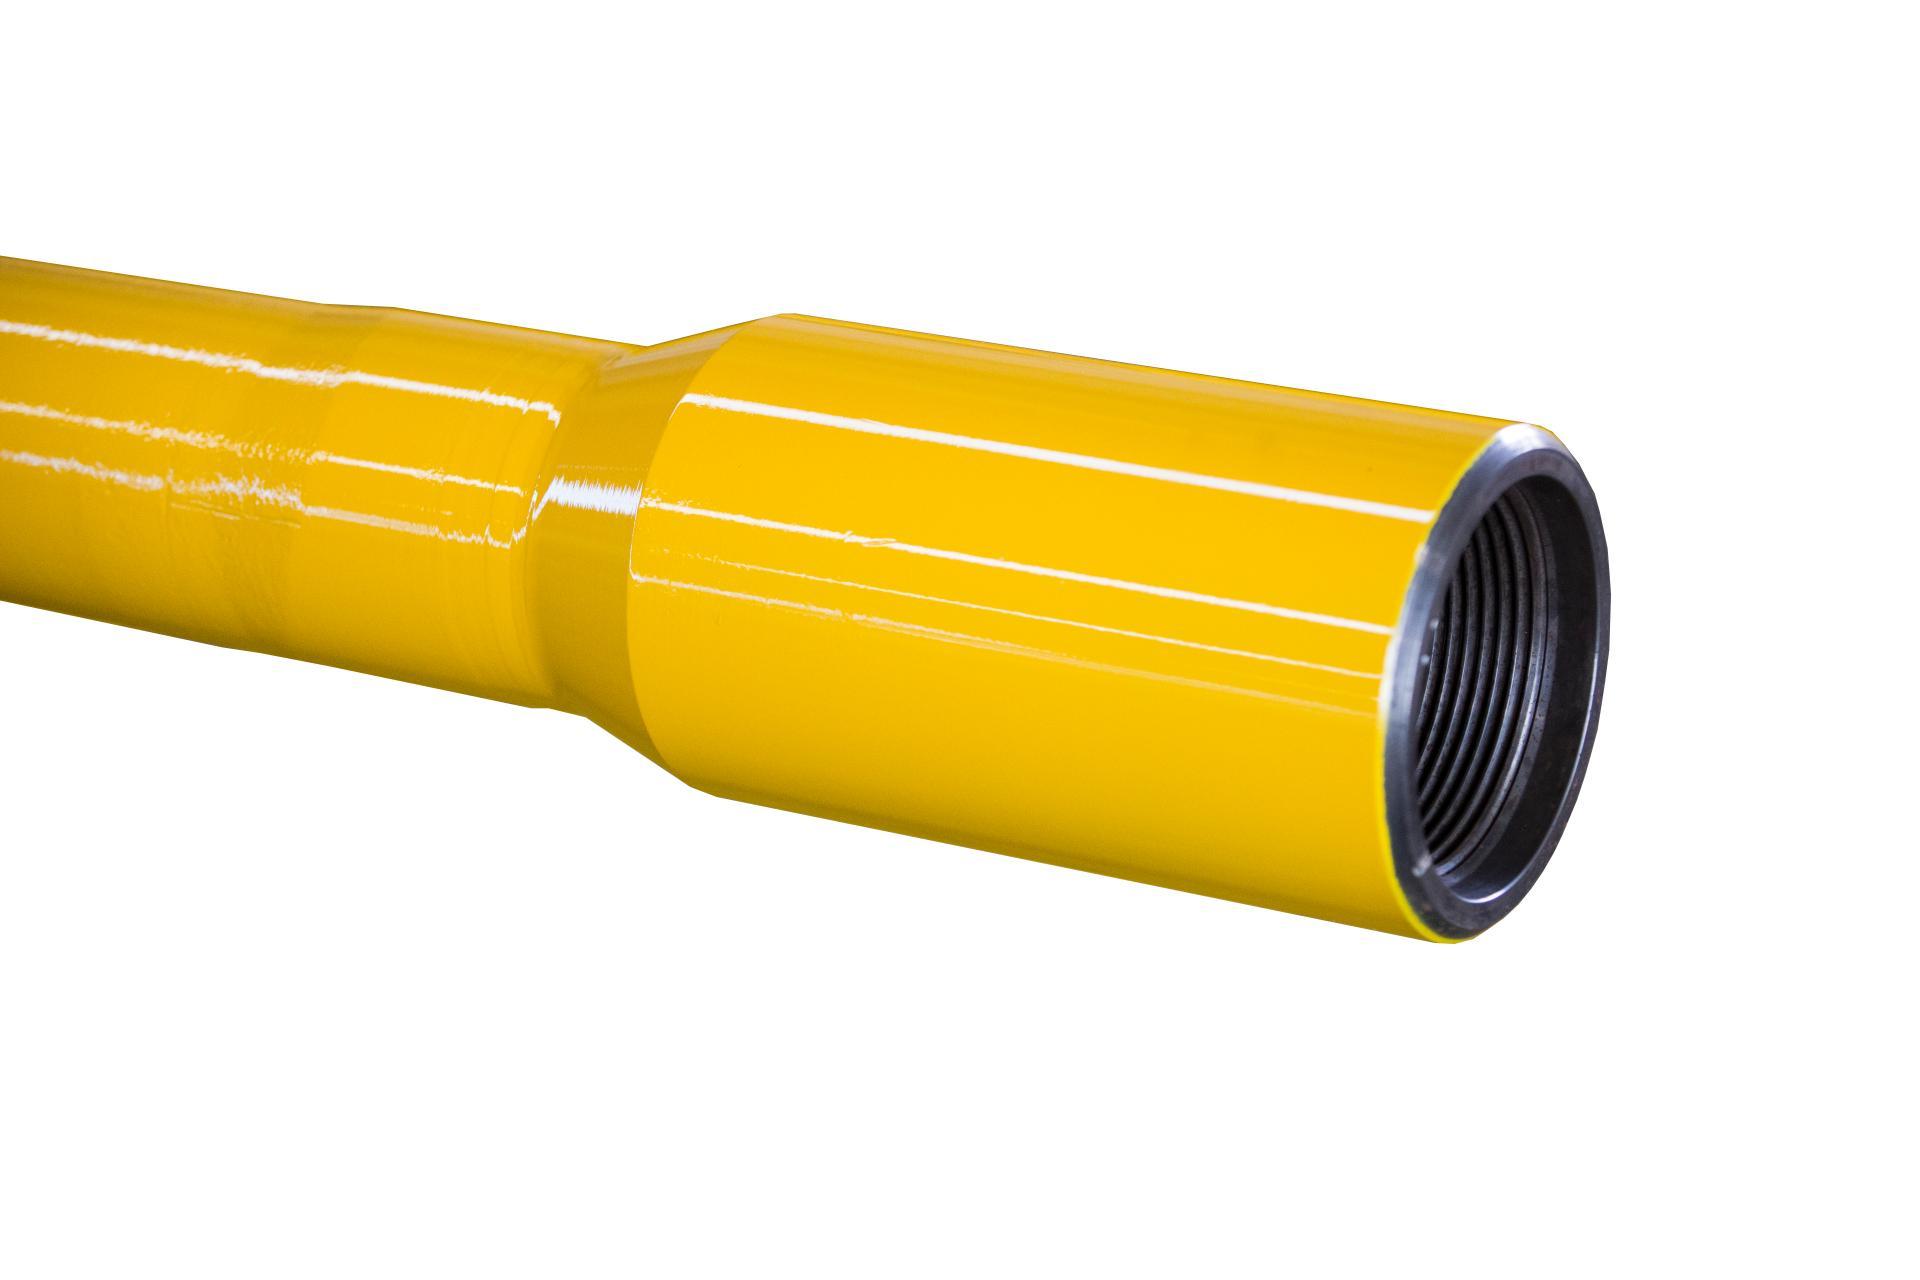 Petroleum drill pipe